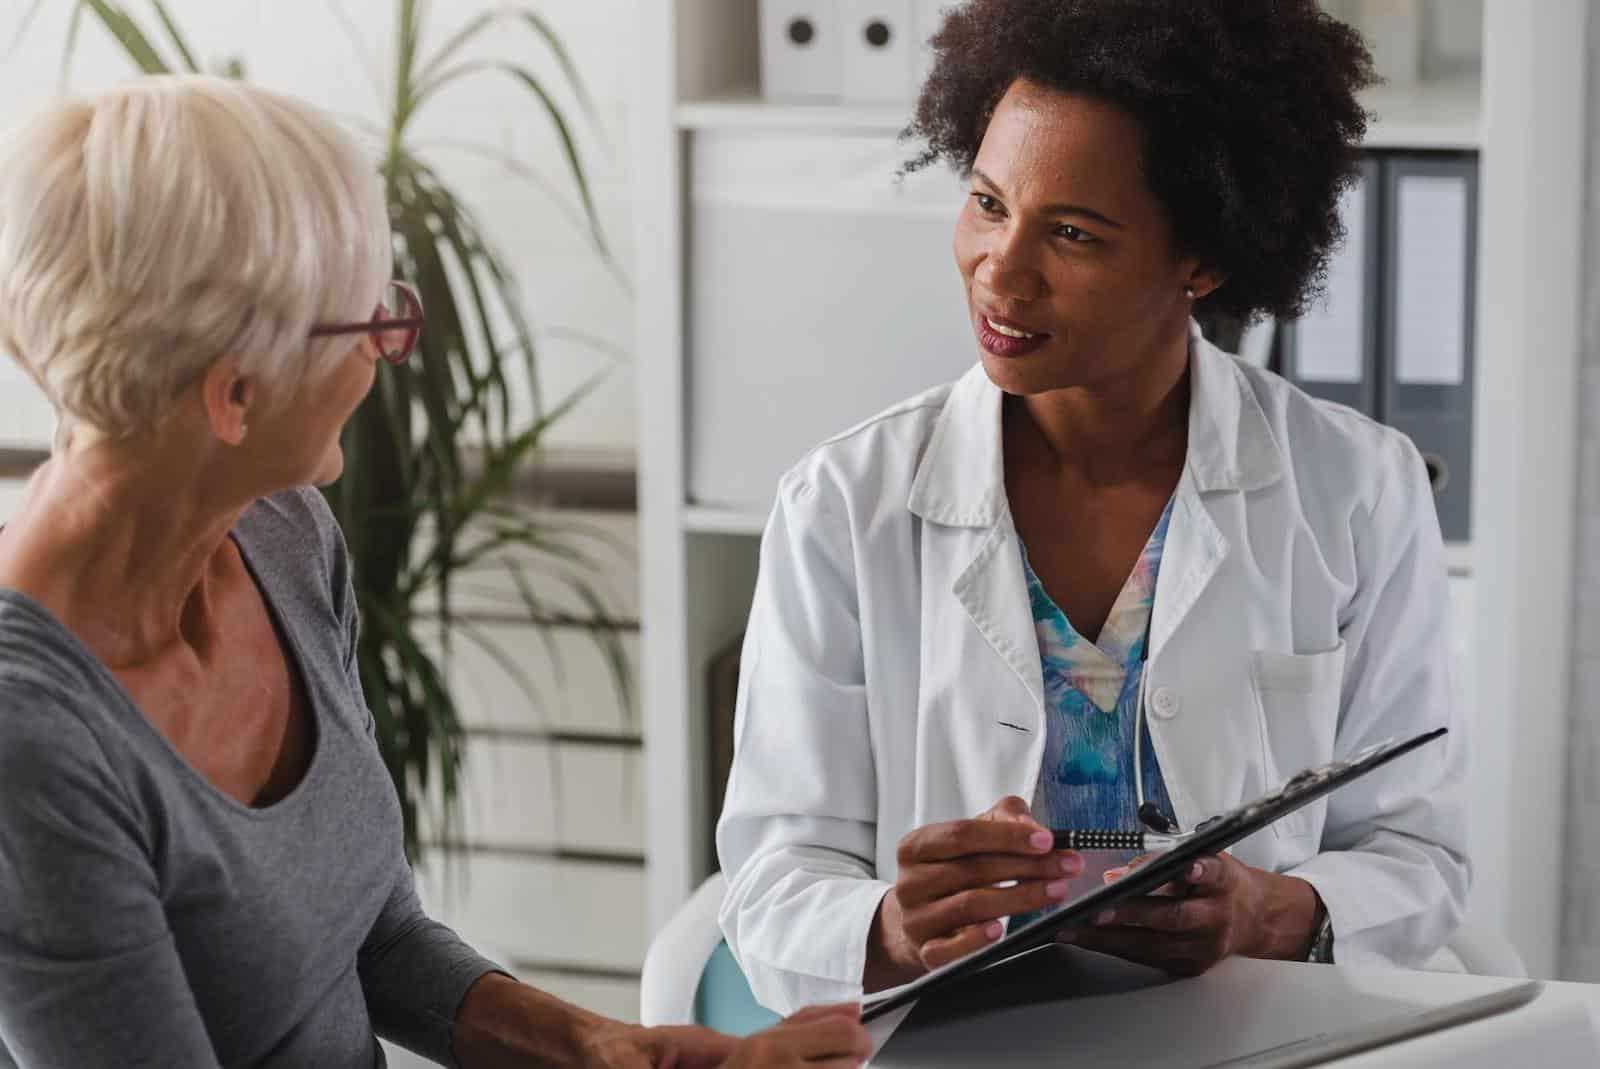 Autoimmune Specialist: Doctor and patient talking